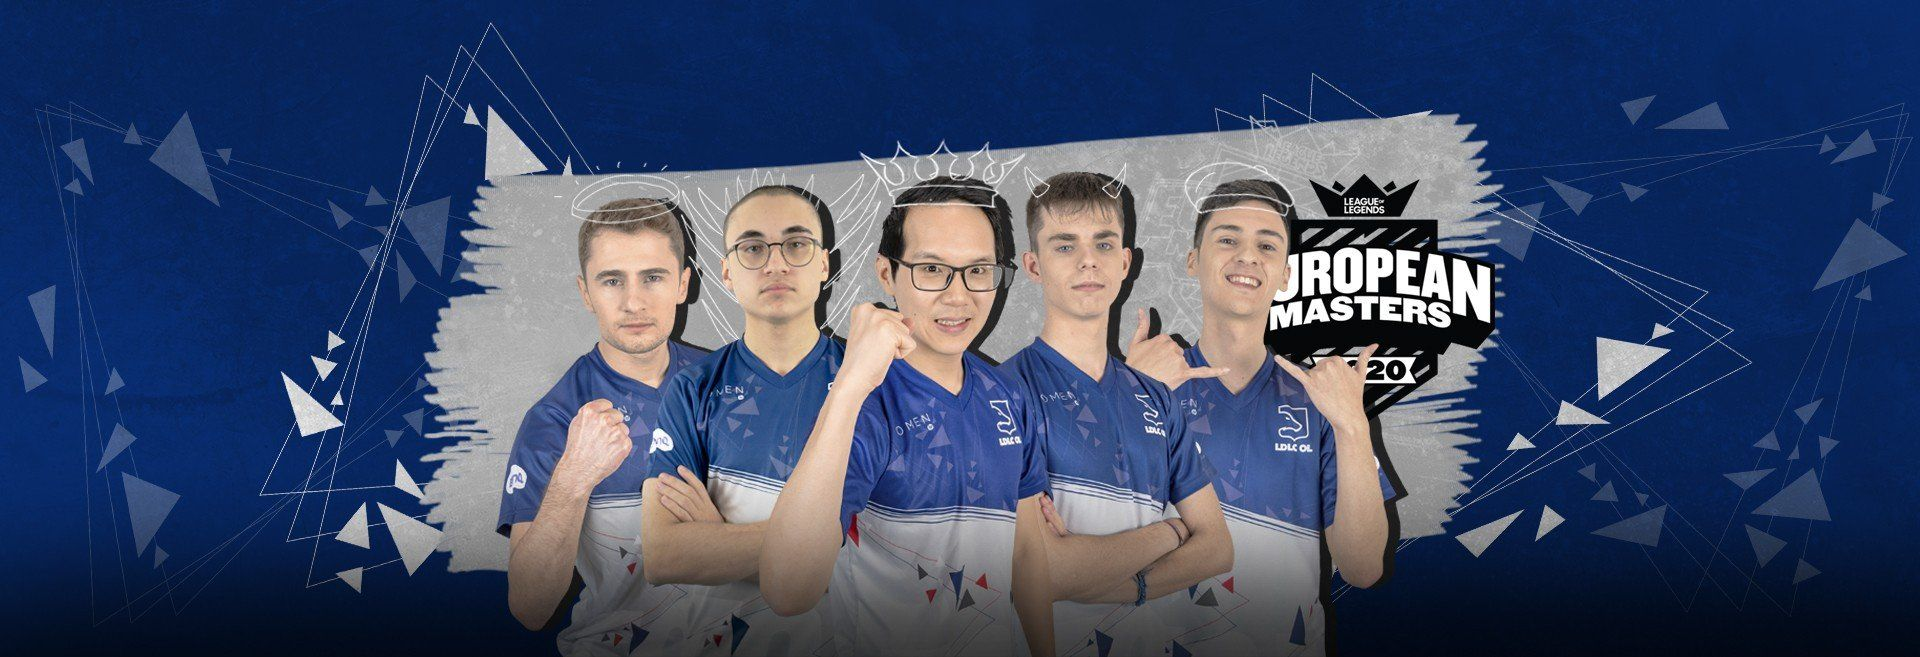 LDLC OL : Champion des European Masters !